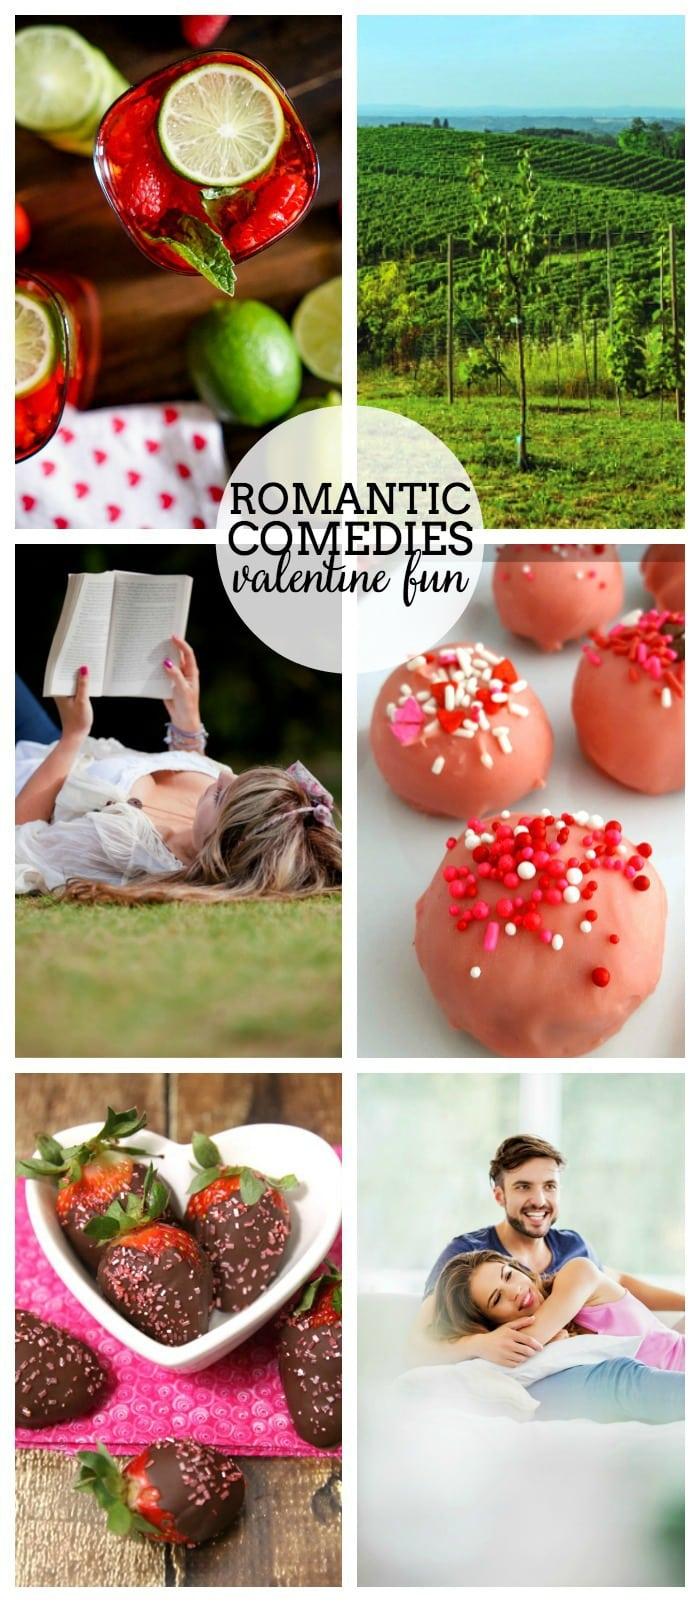 Celebrate Your Love of Romantic Comedies